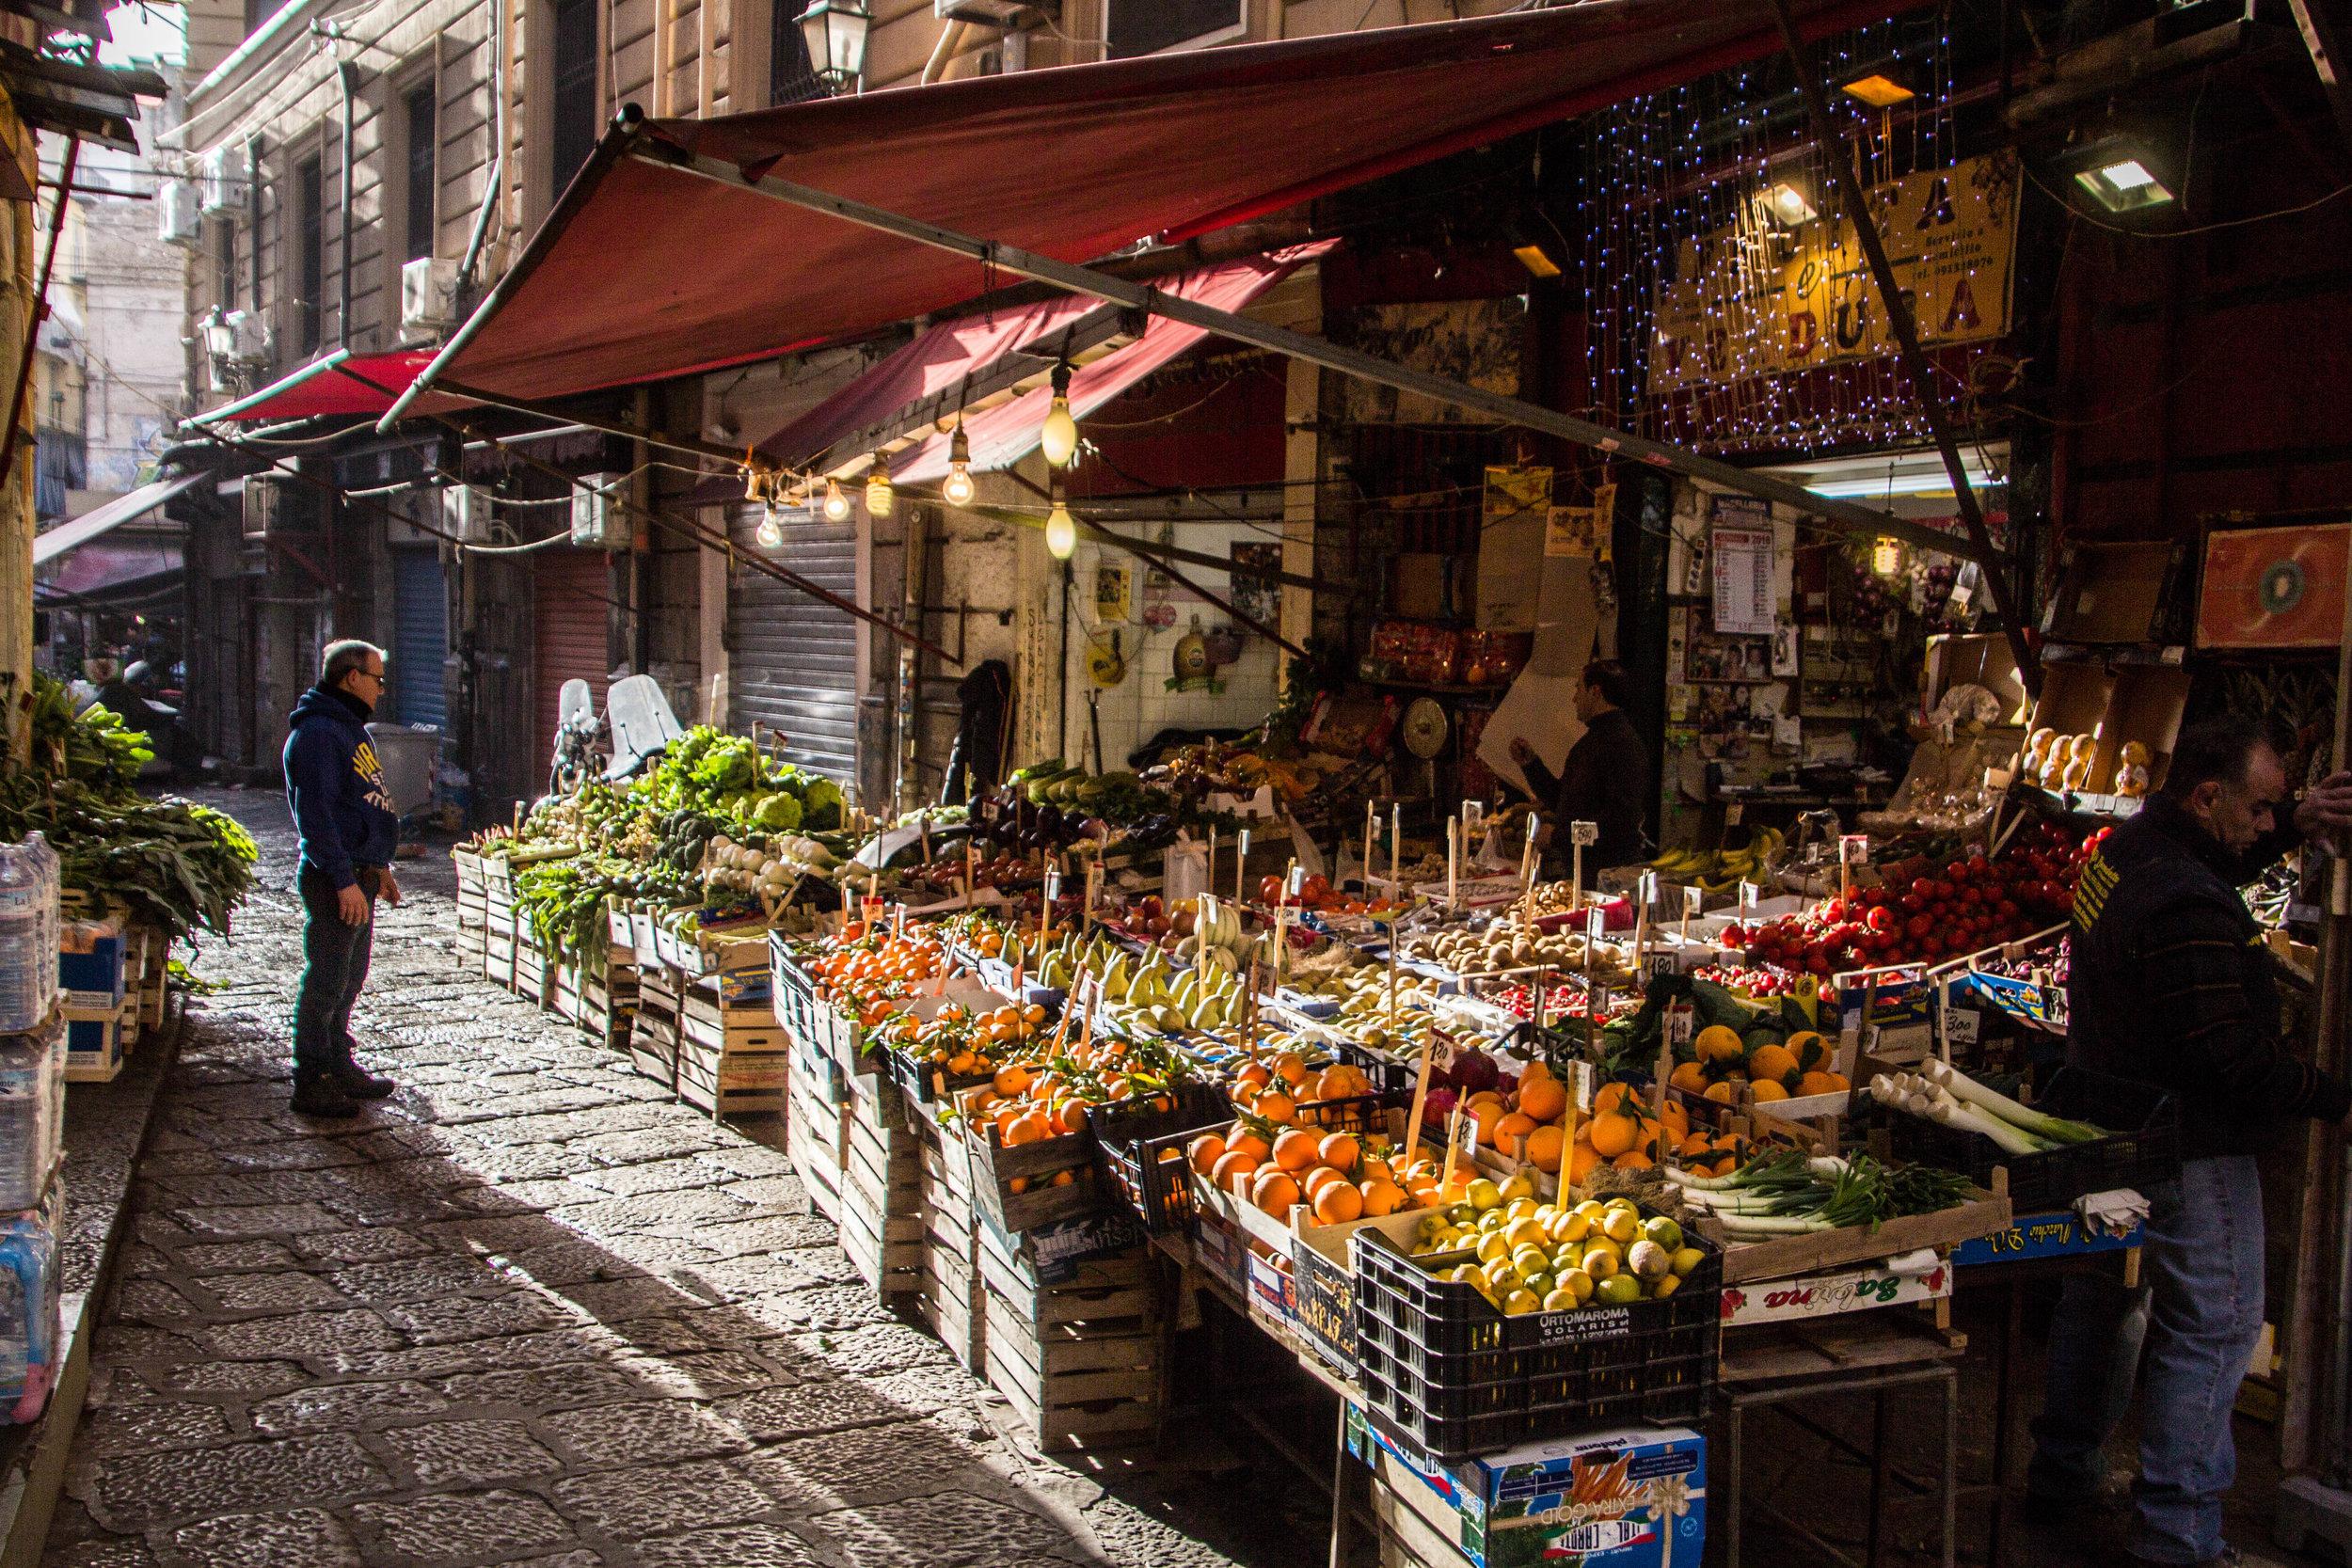 street-photography-palermo-sicily-19.jpg